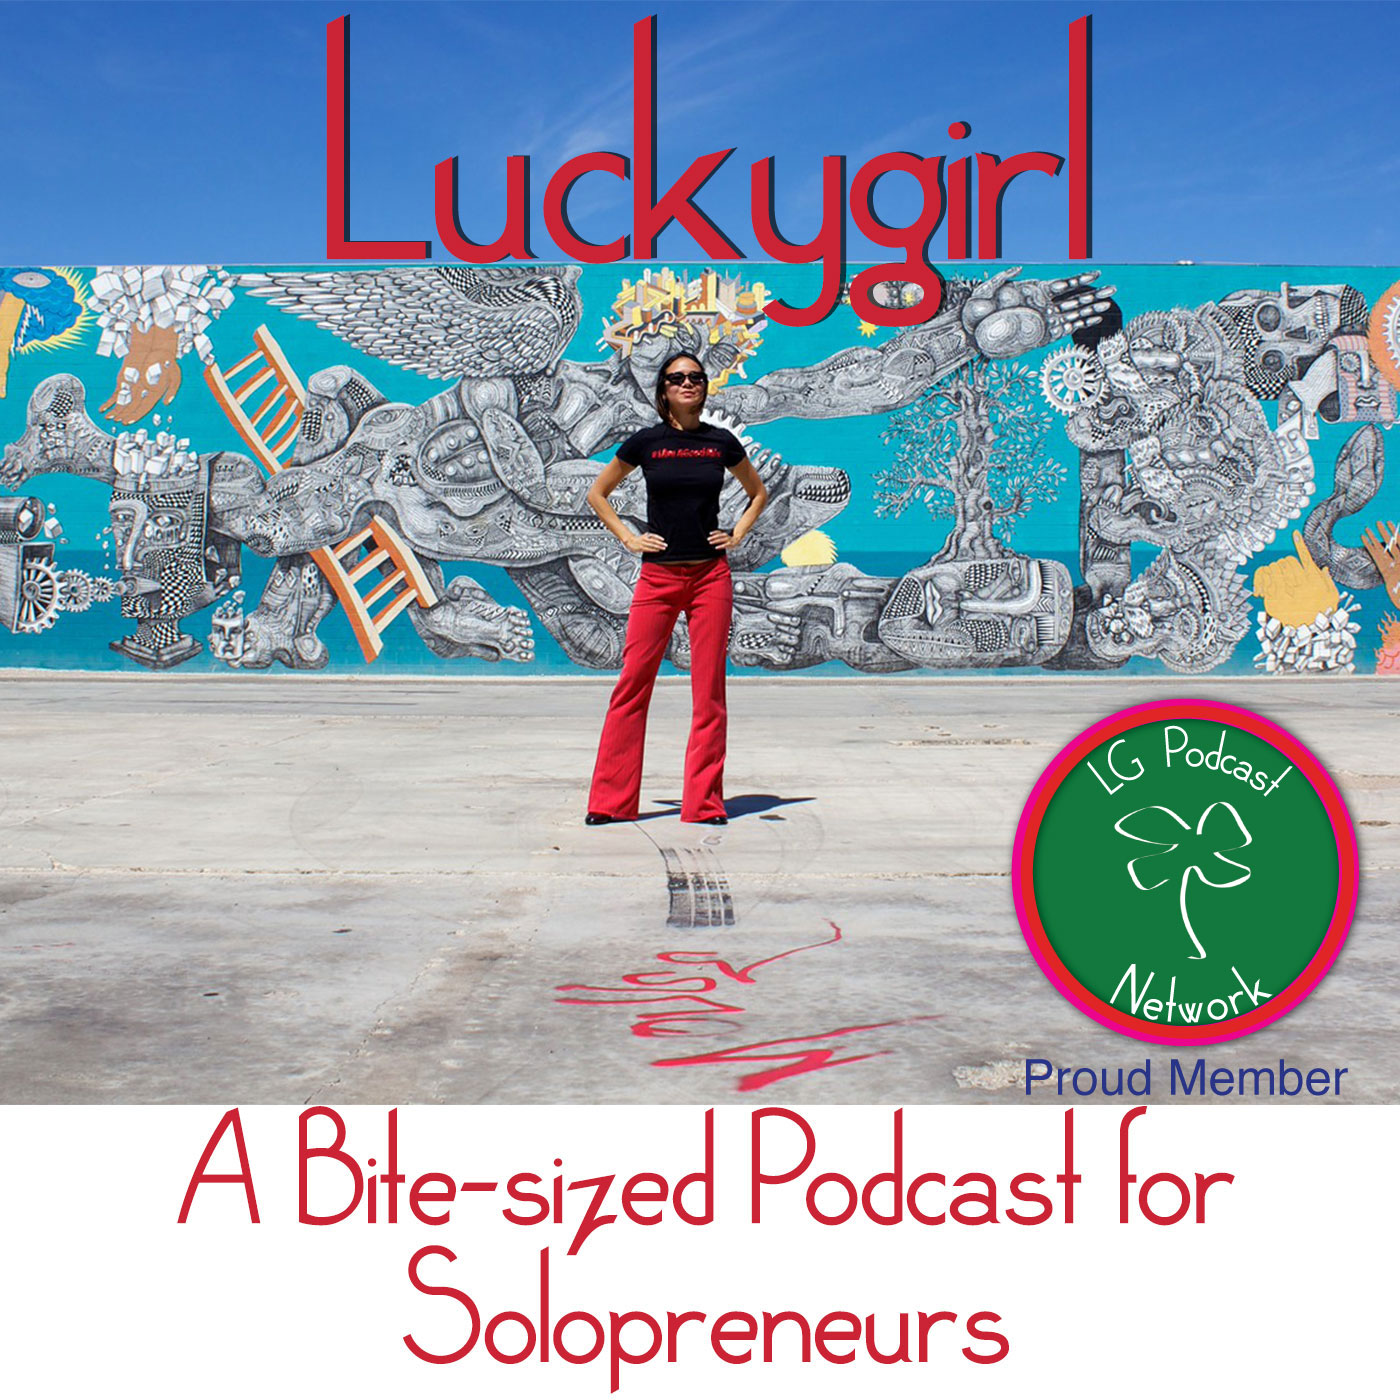 A bite-sized podcast for solopreneurs: Luckygirl show art